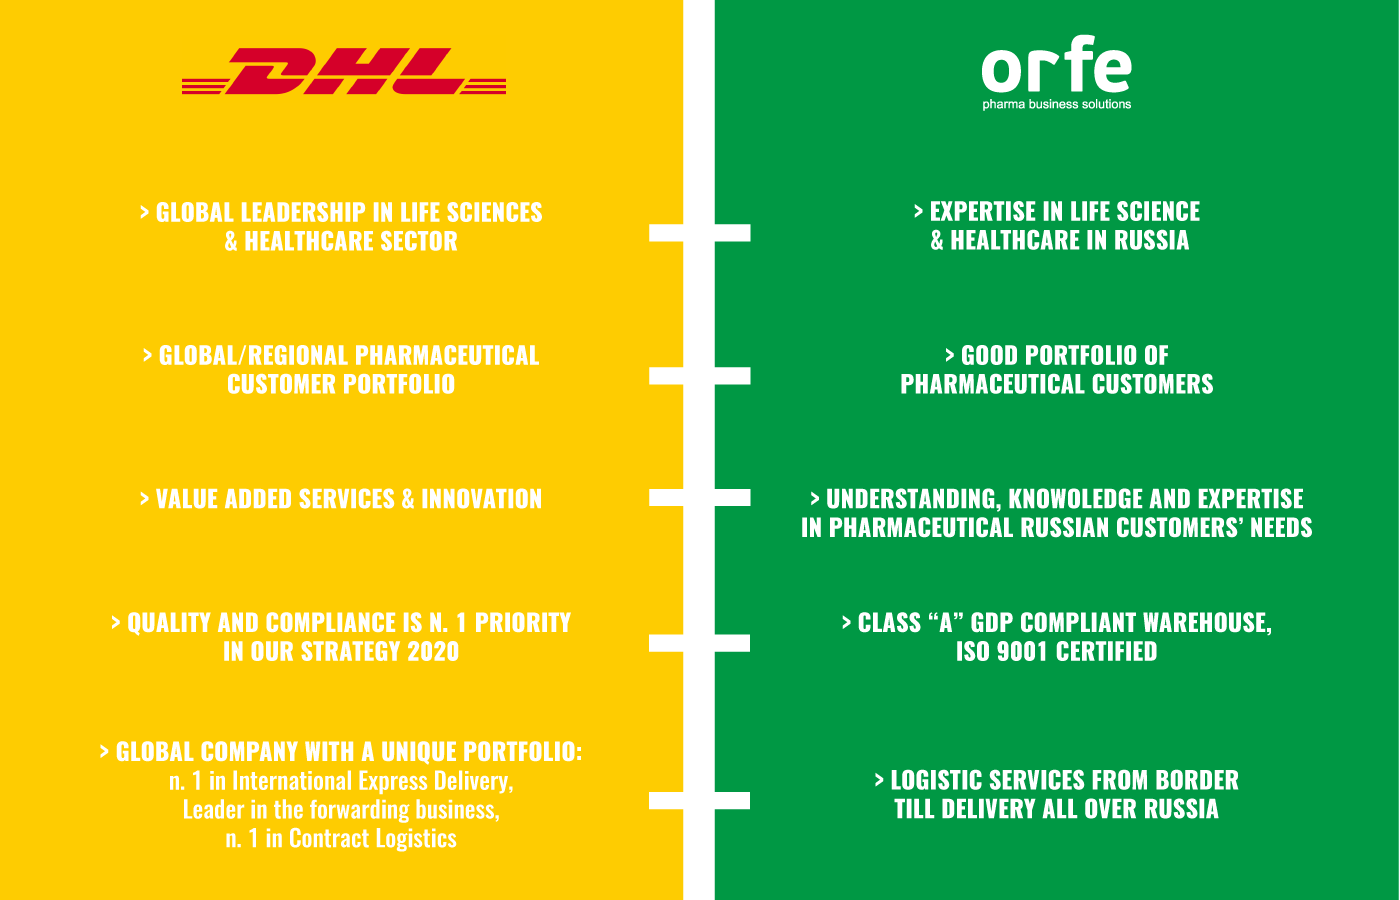 orfe-dhl-img